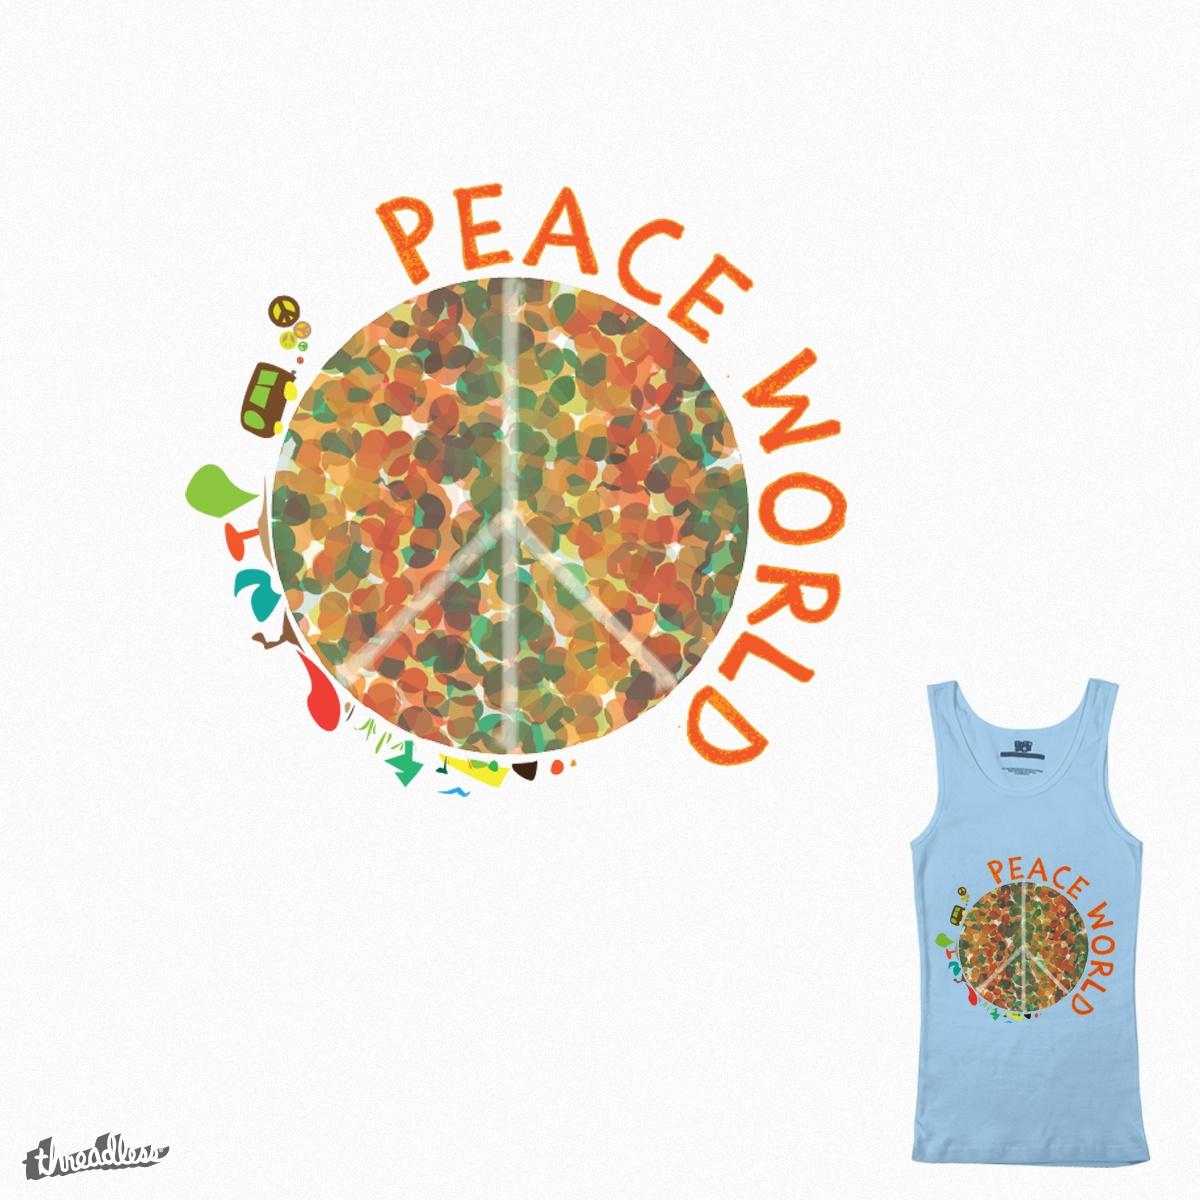 Peace World by faridfadila on Threadless